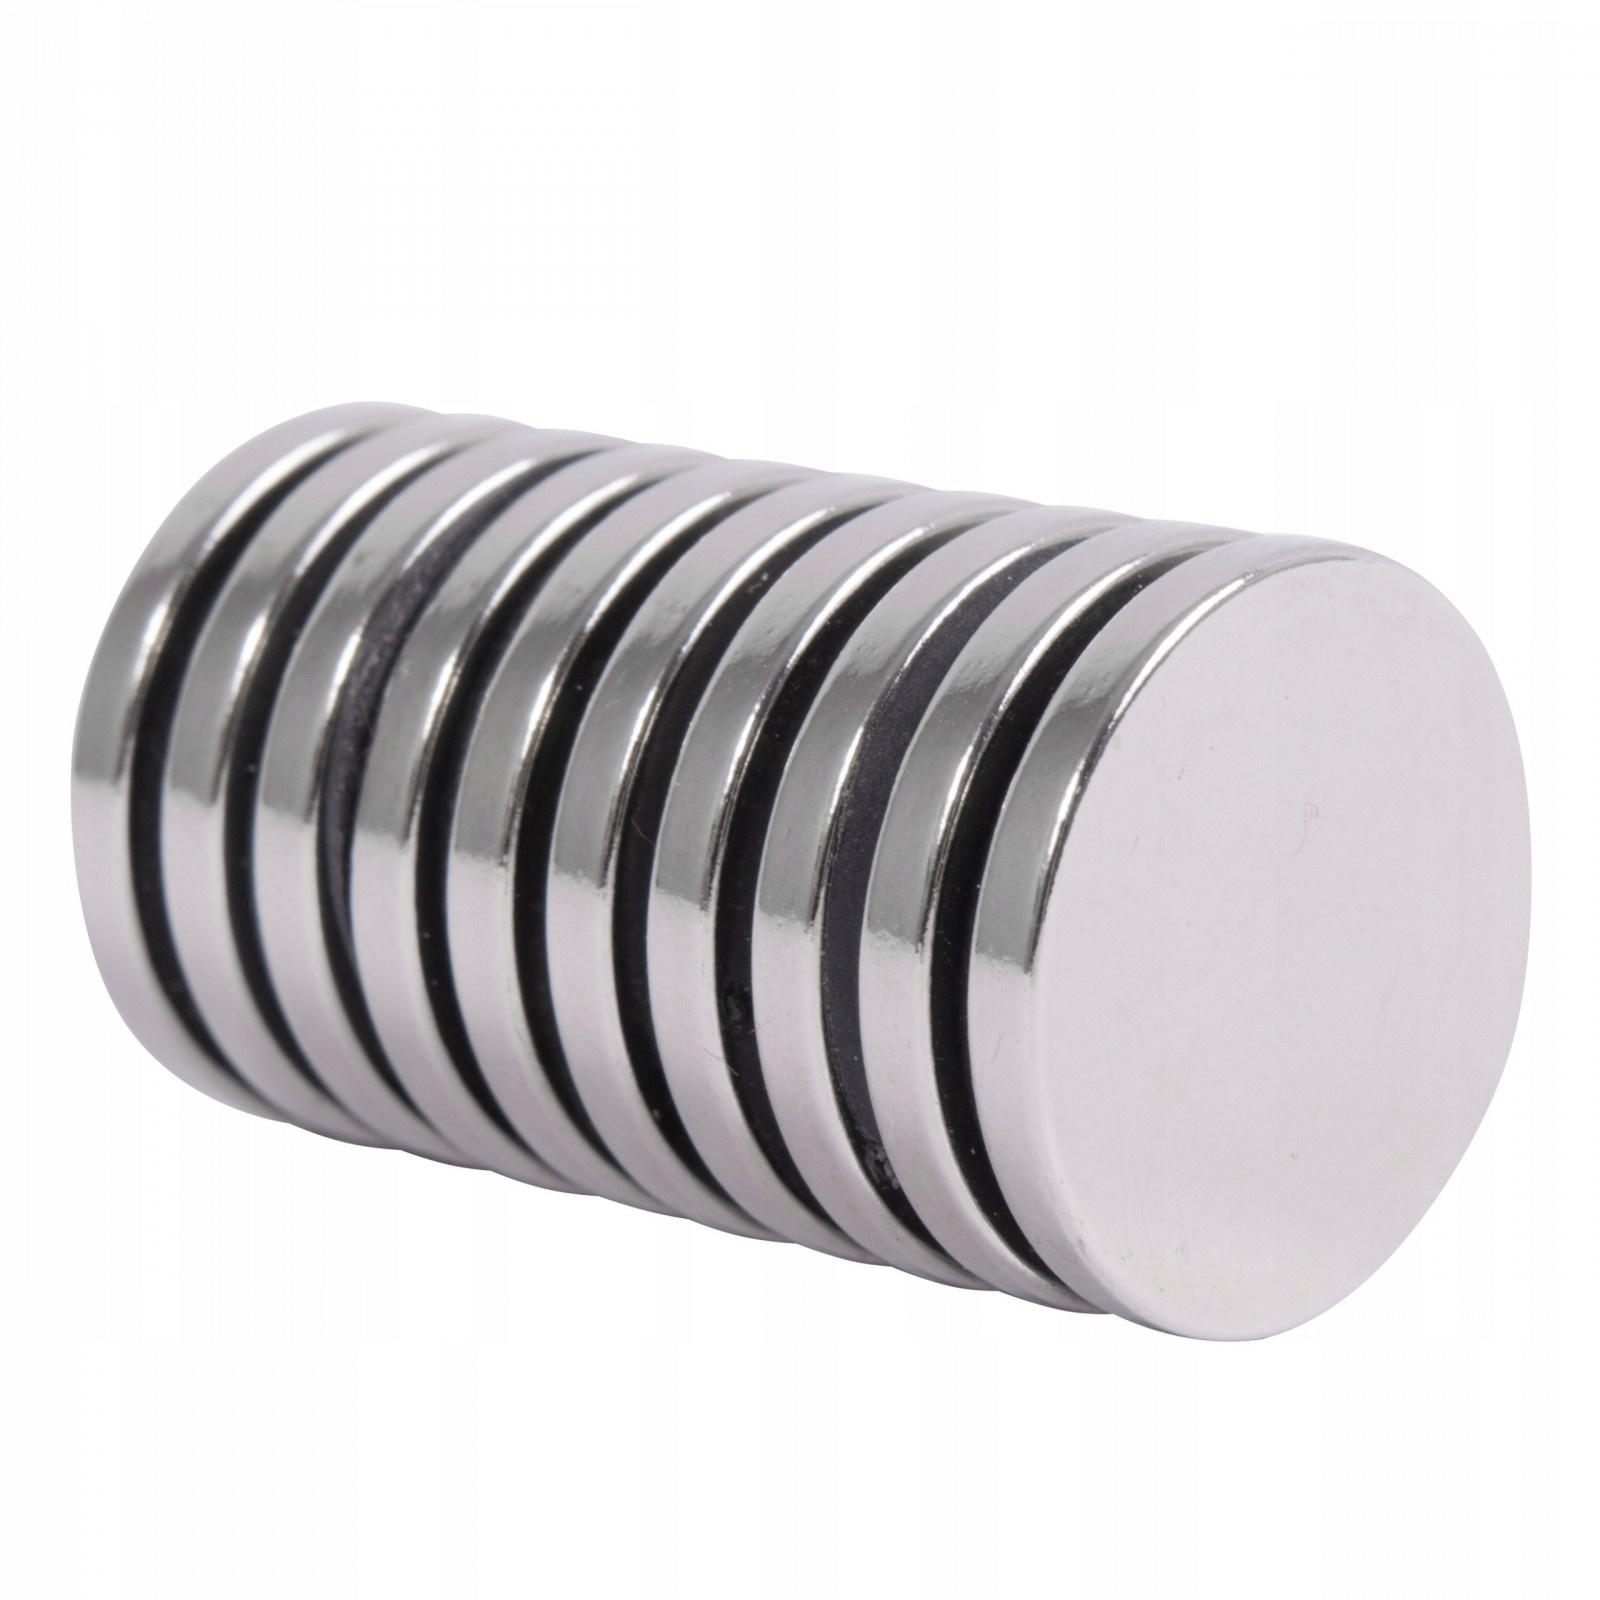 Neodymiový magnet 10ks 20x3mm N45 megamix.sk